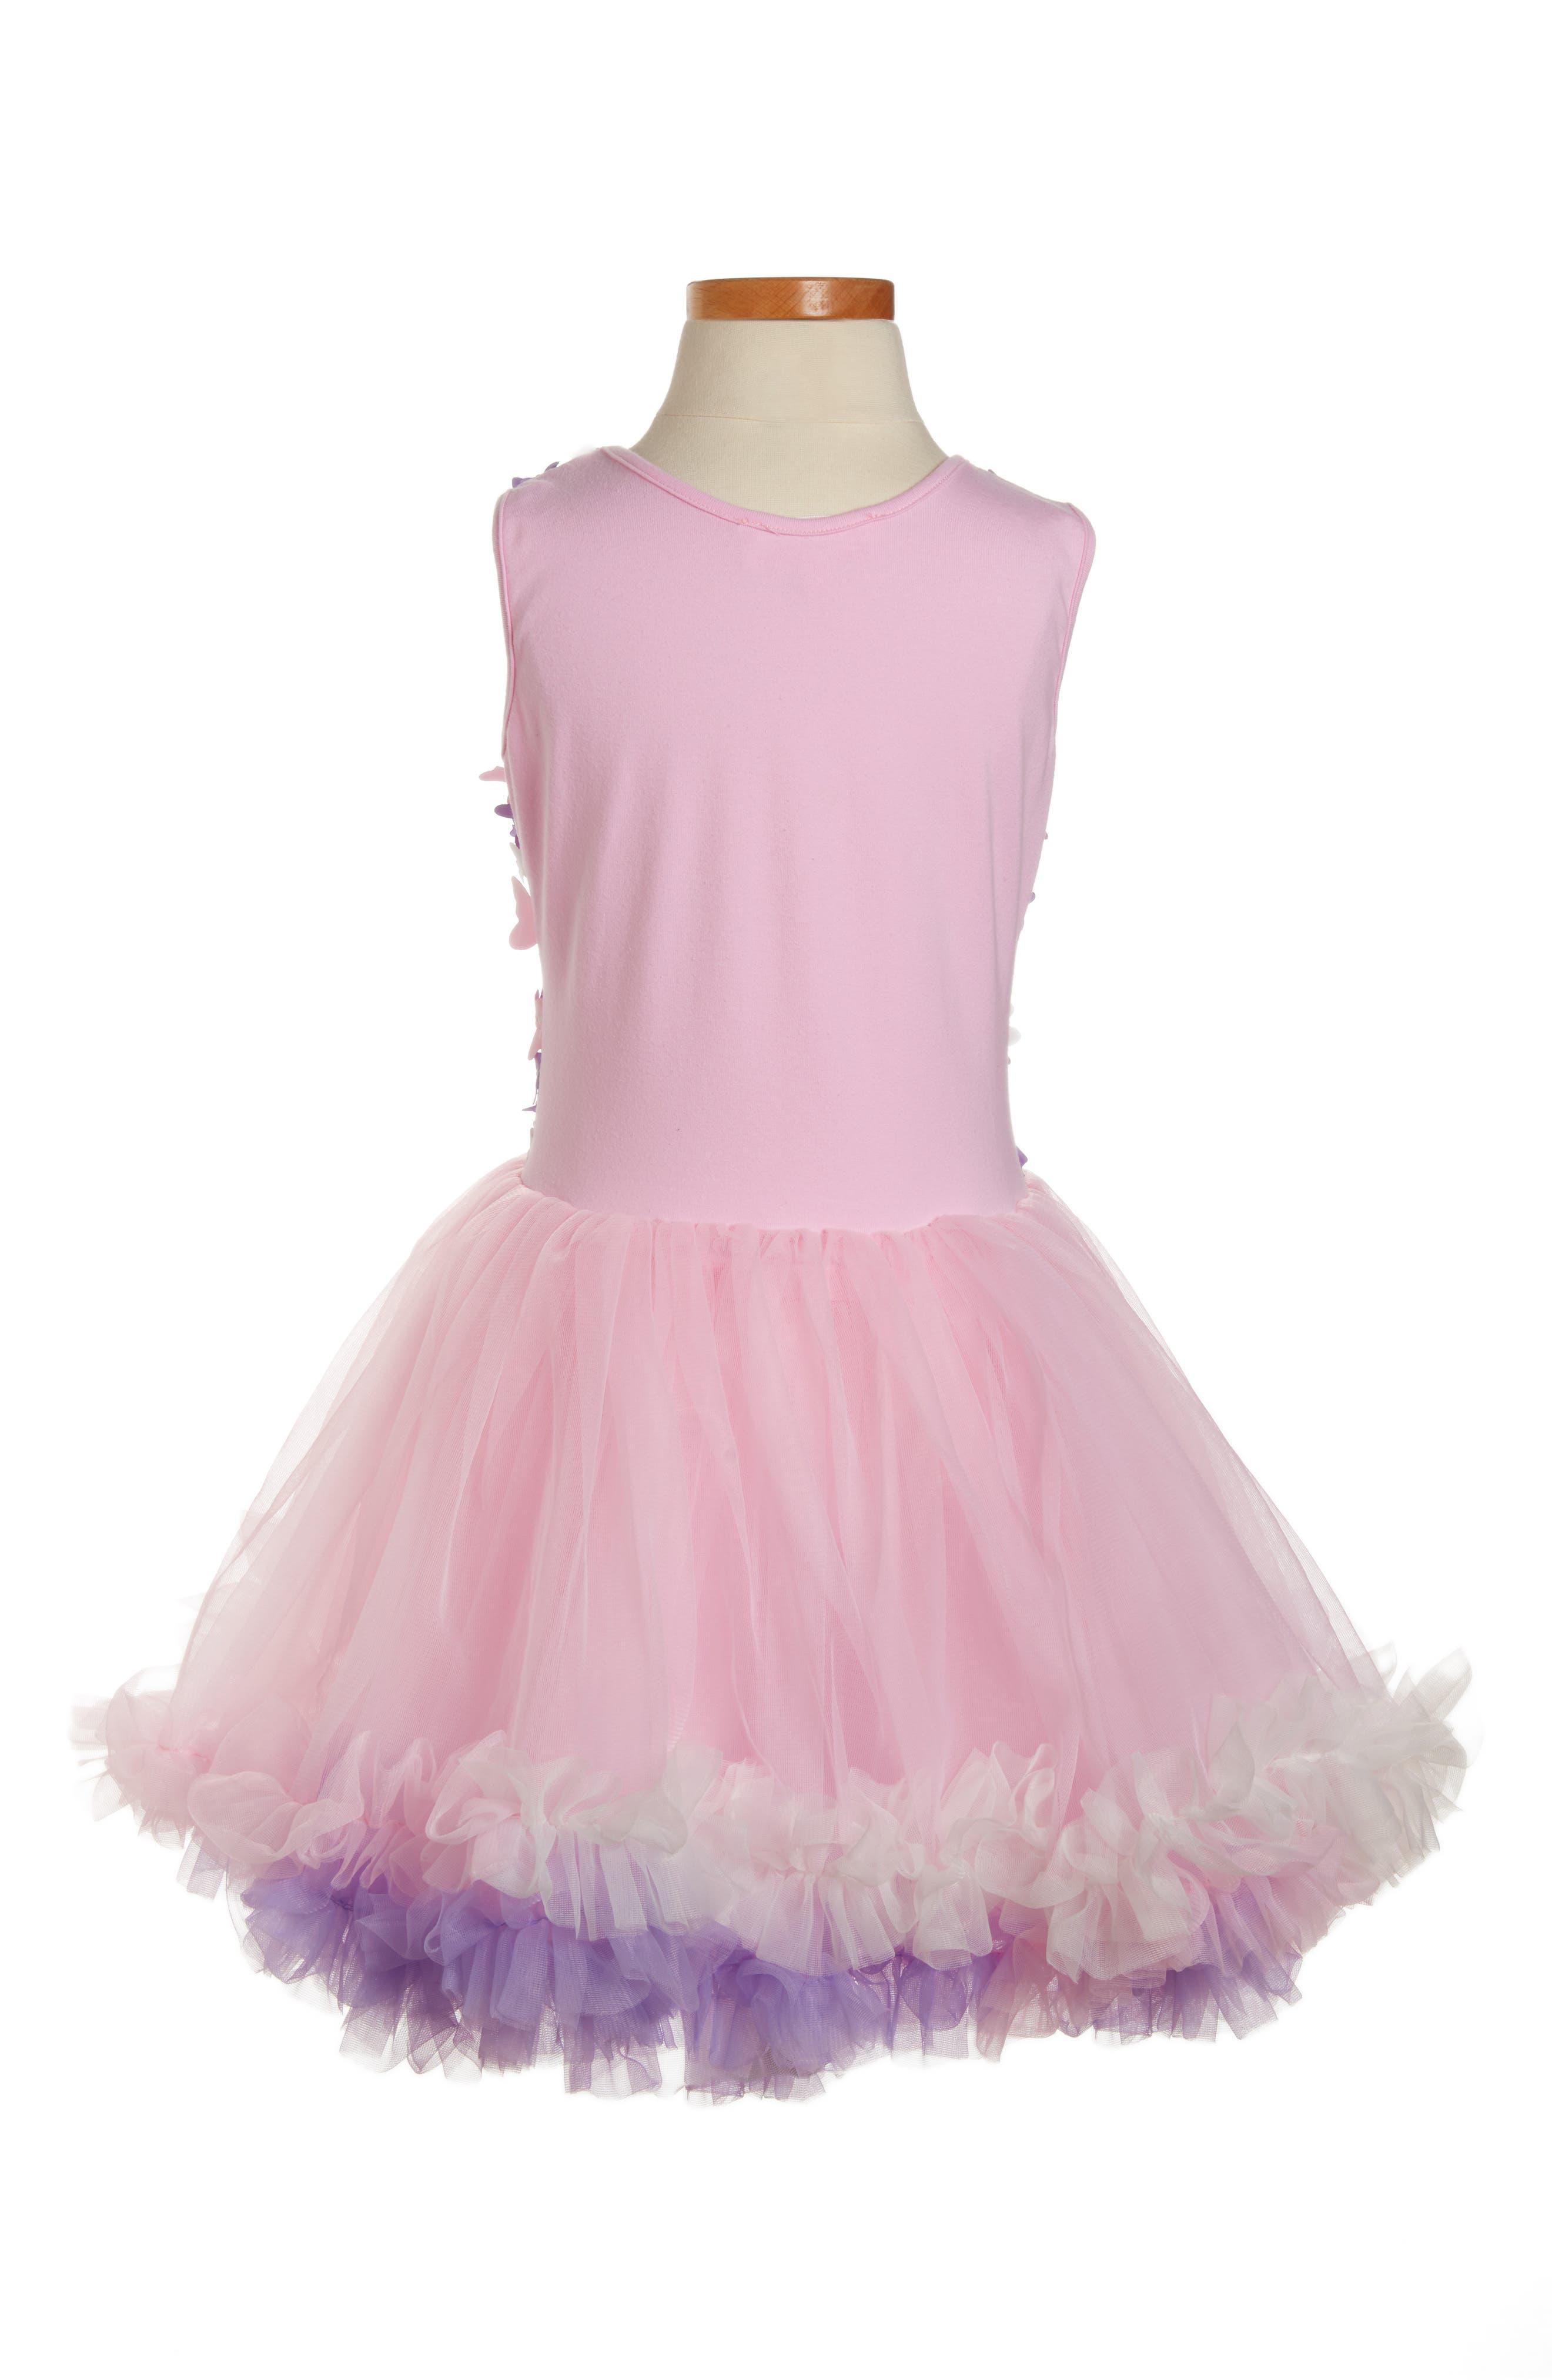 Butterfly Sleeveless Dress,                             Alternate thumbnail 2, color,                             Pink/ Purple Multi